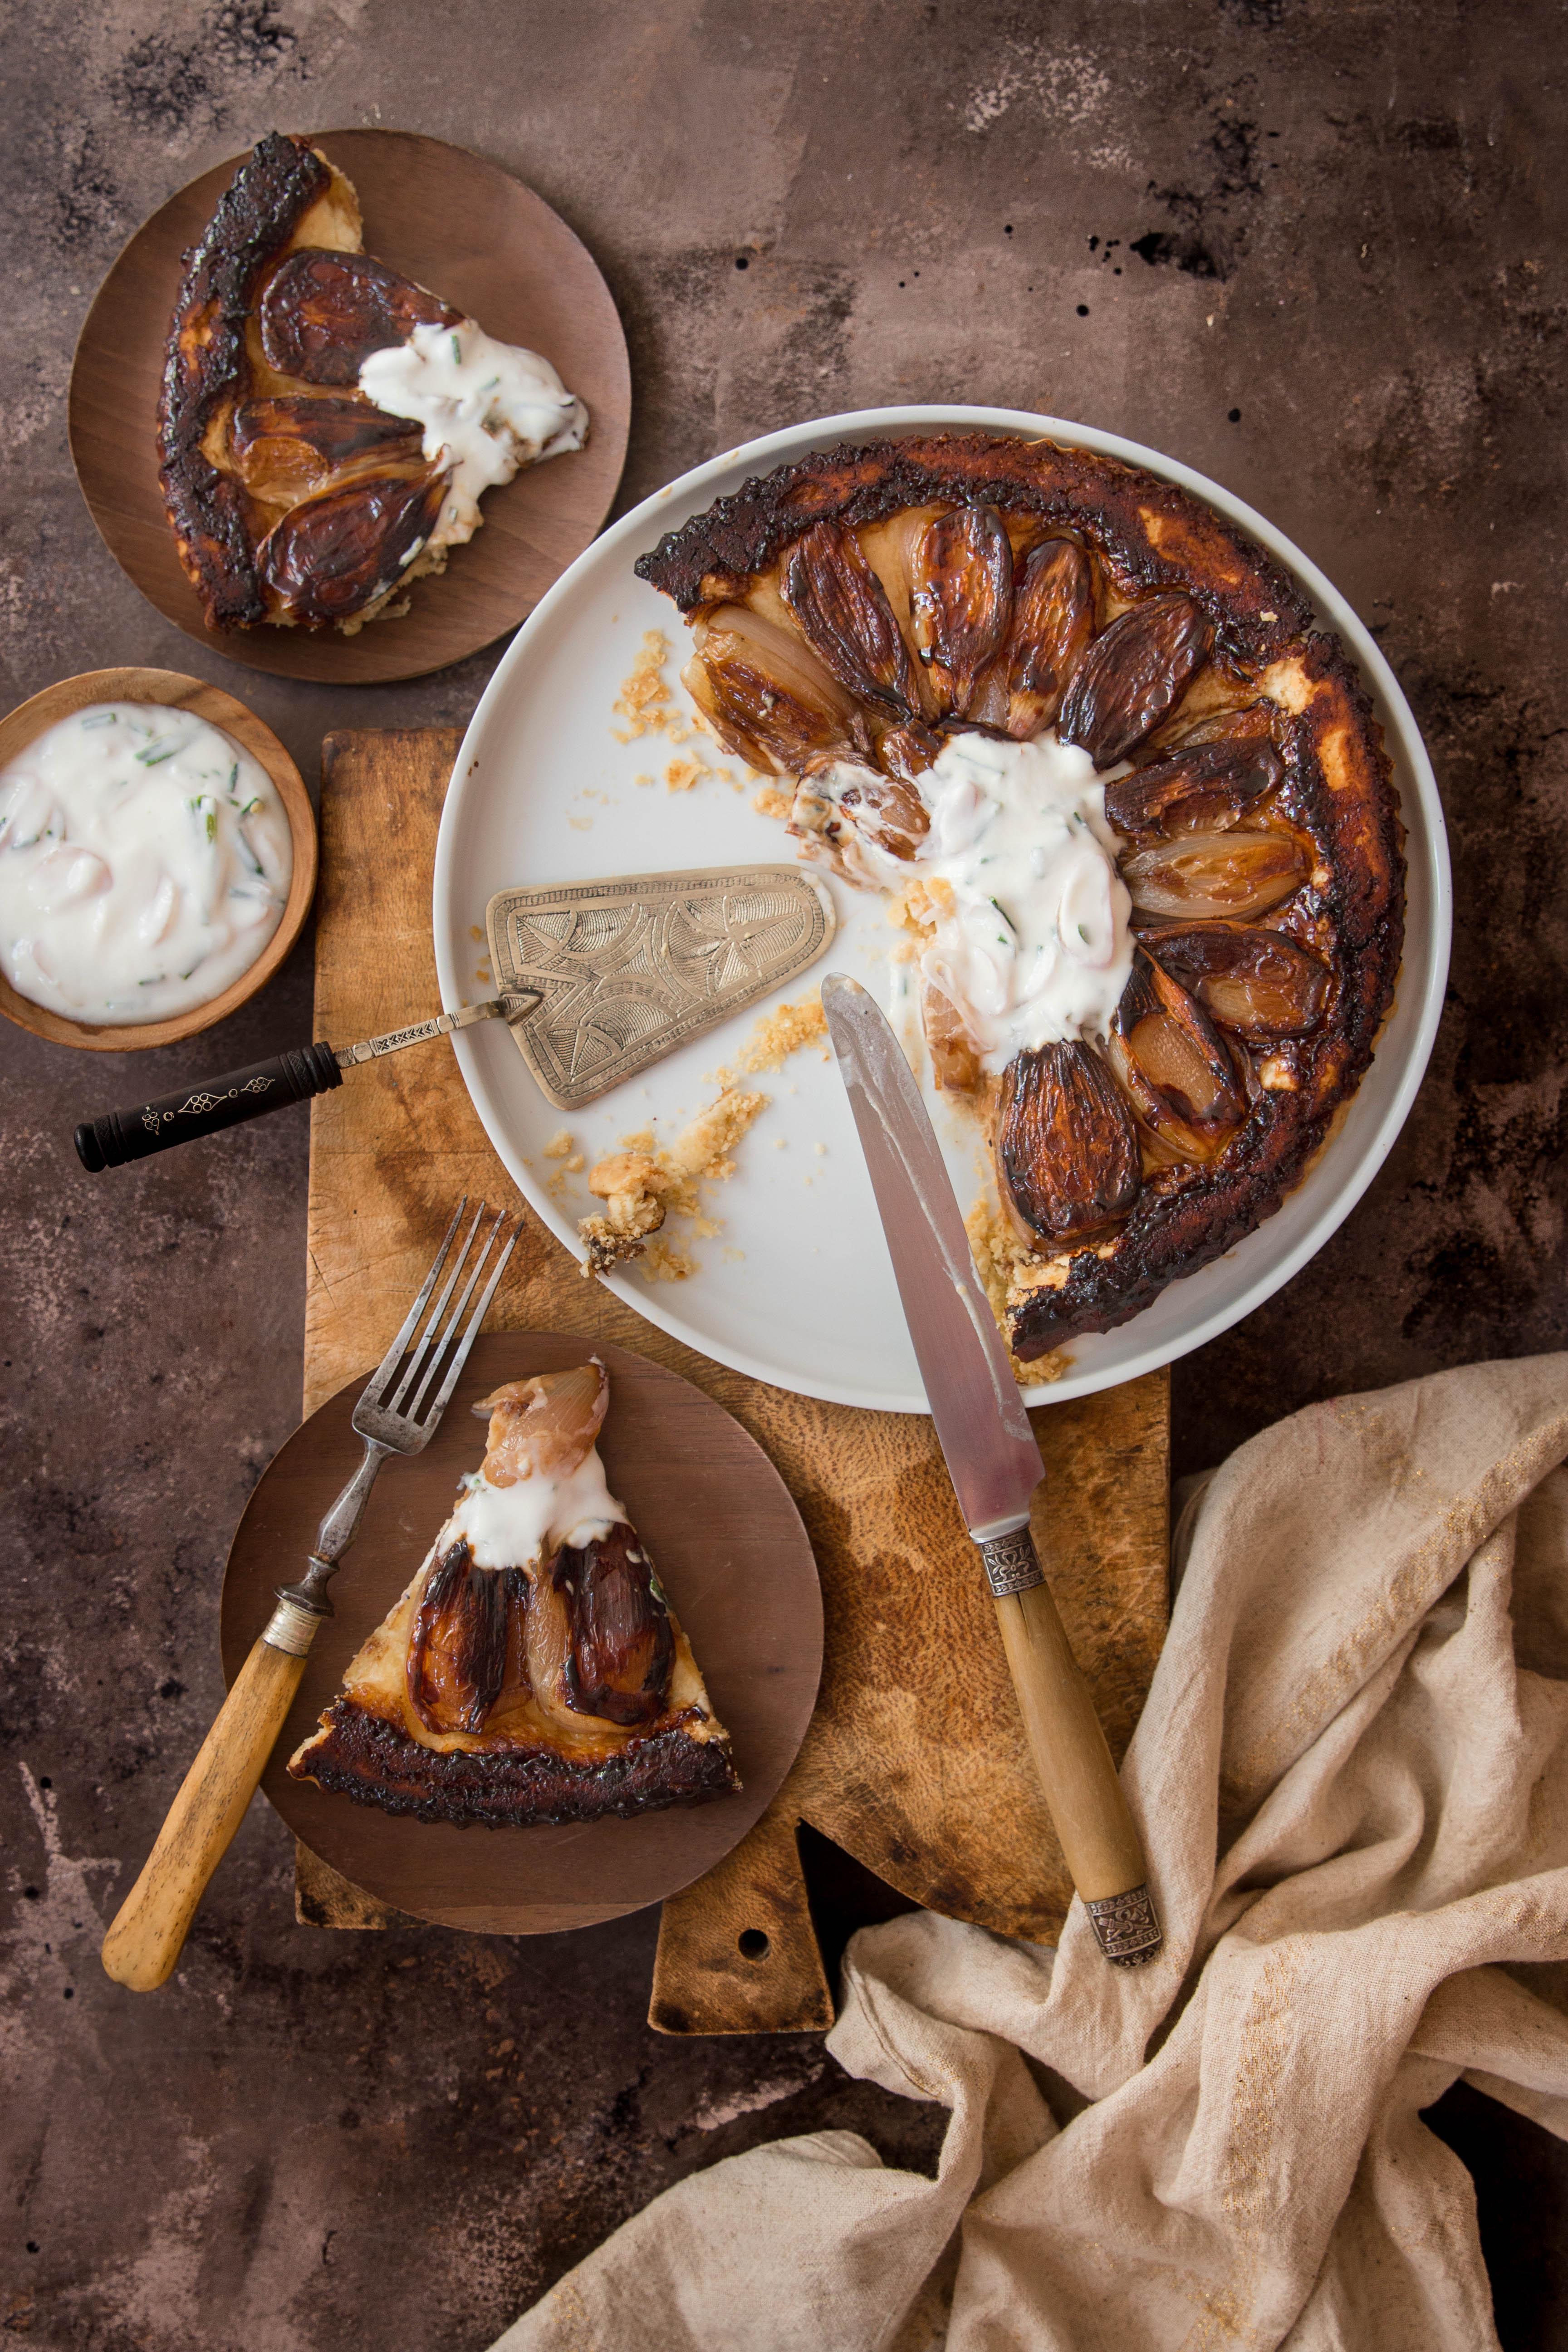 Tarte tatin aux échalotes et caramel balsamique - photography